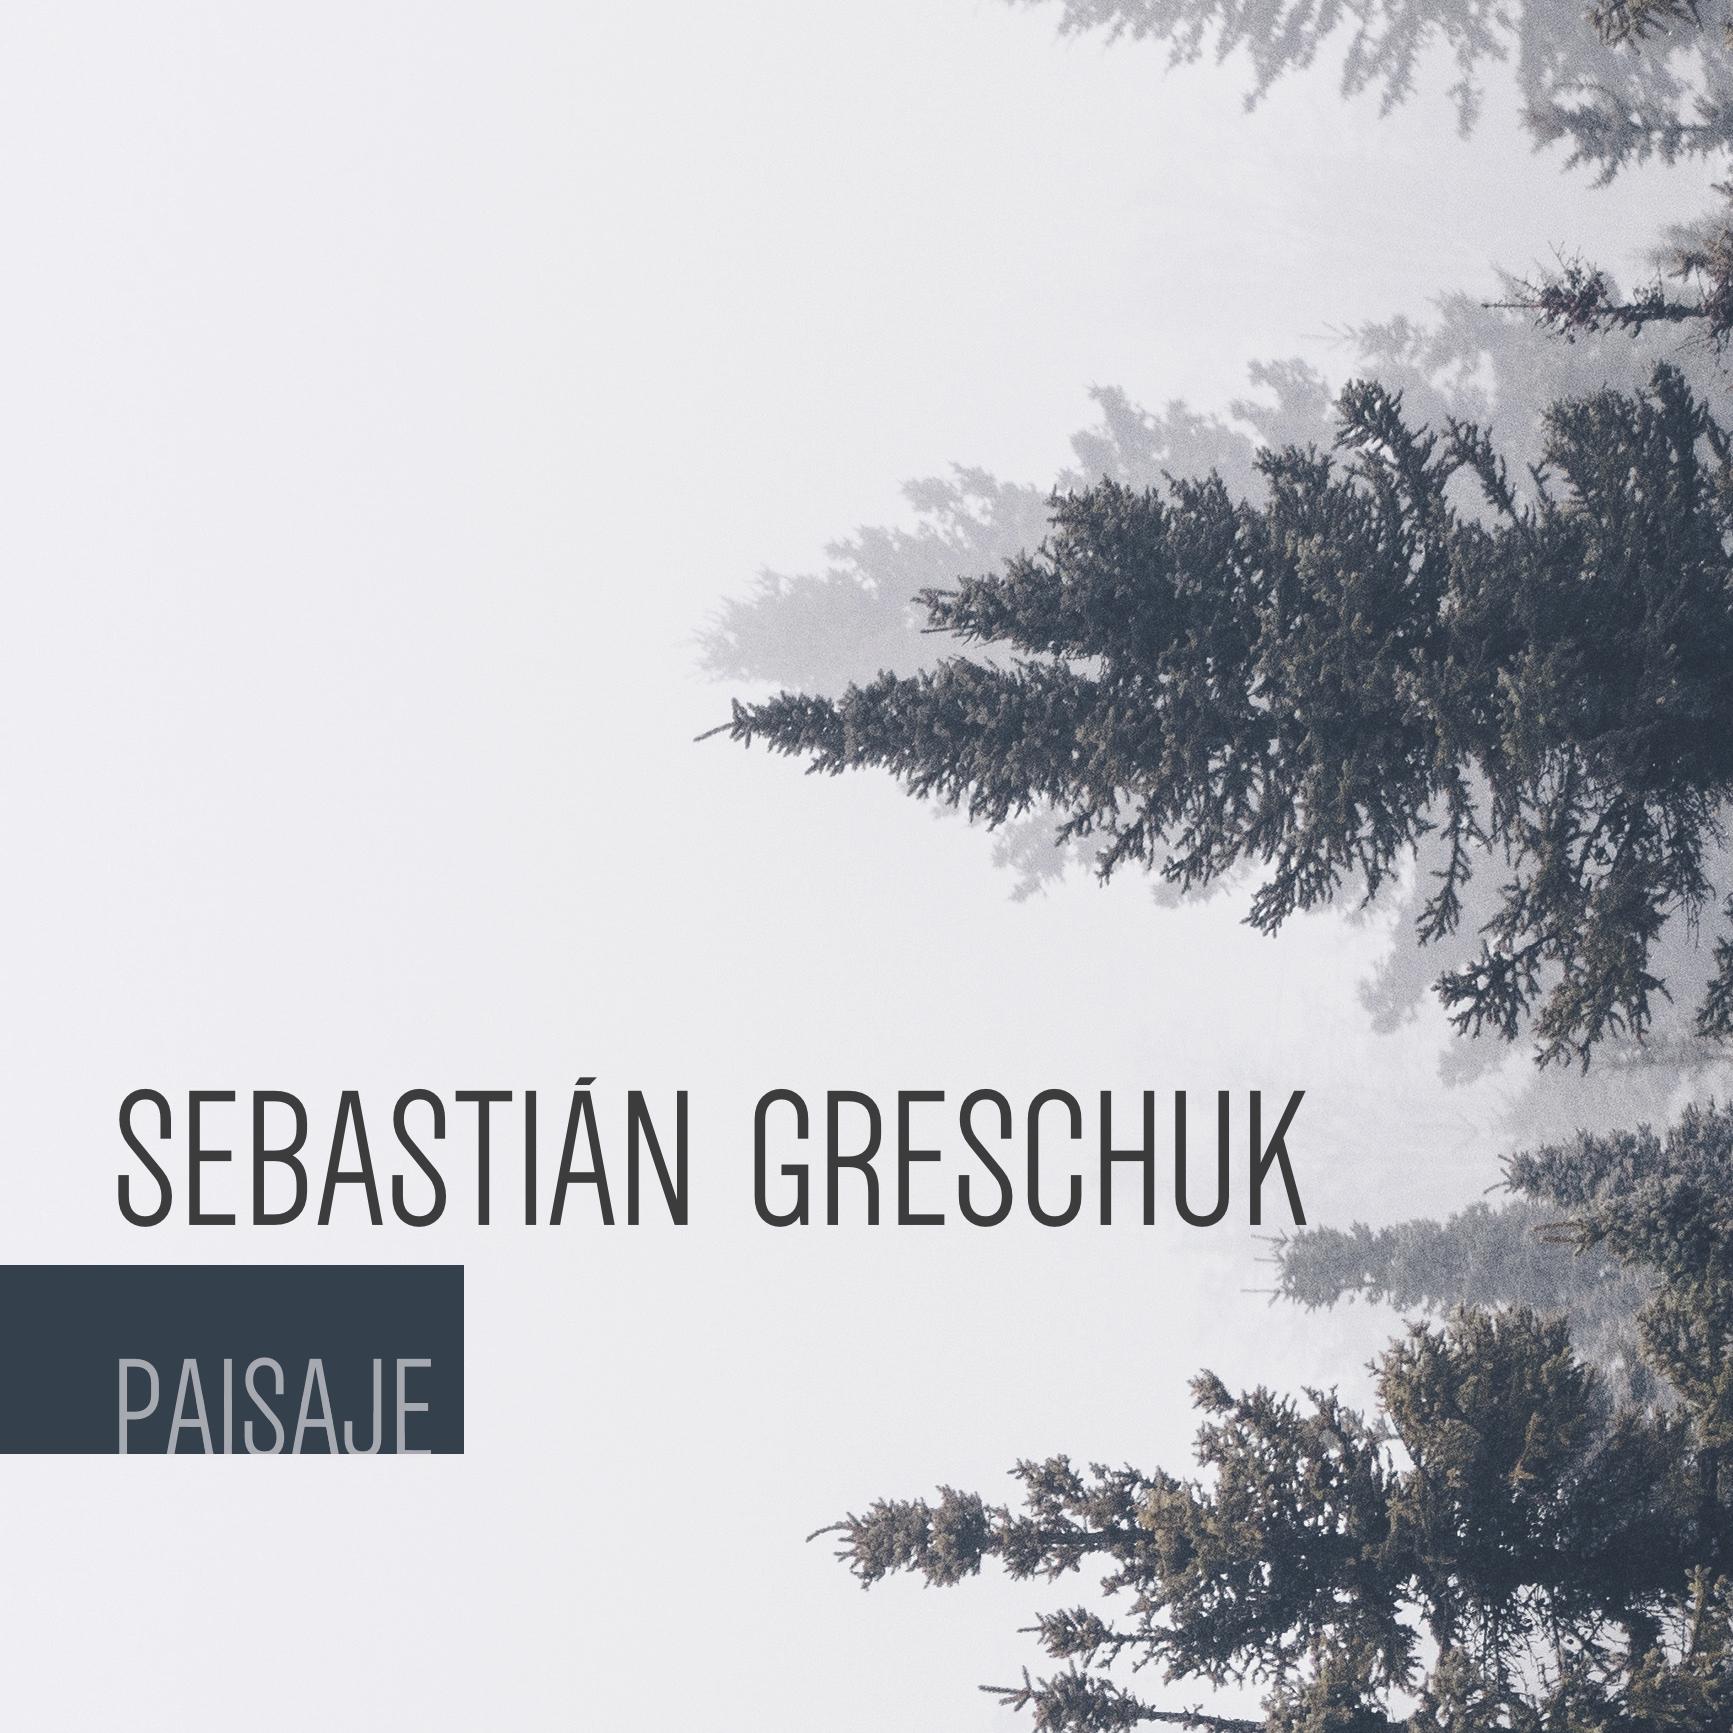 Sebastian Greschuk | Paisaje   Released in July CD/digital